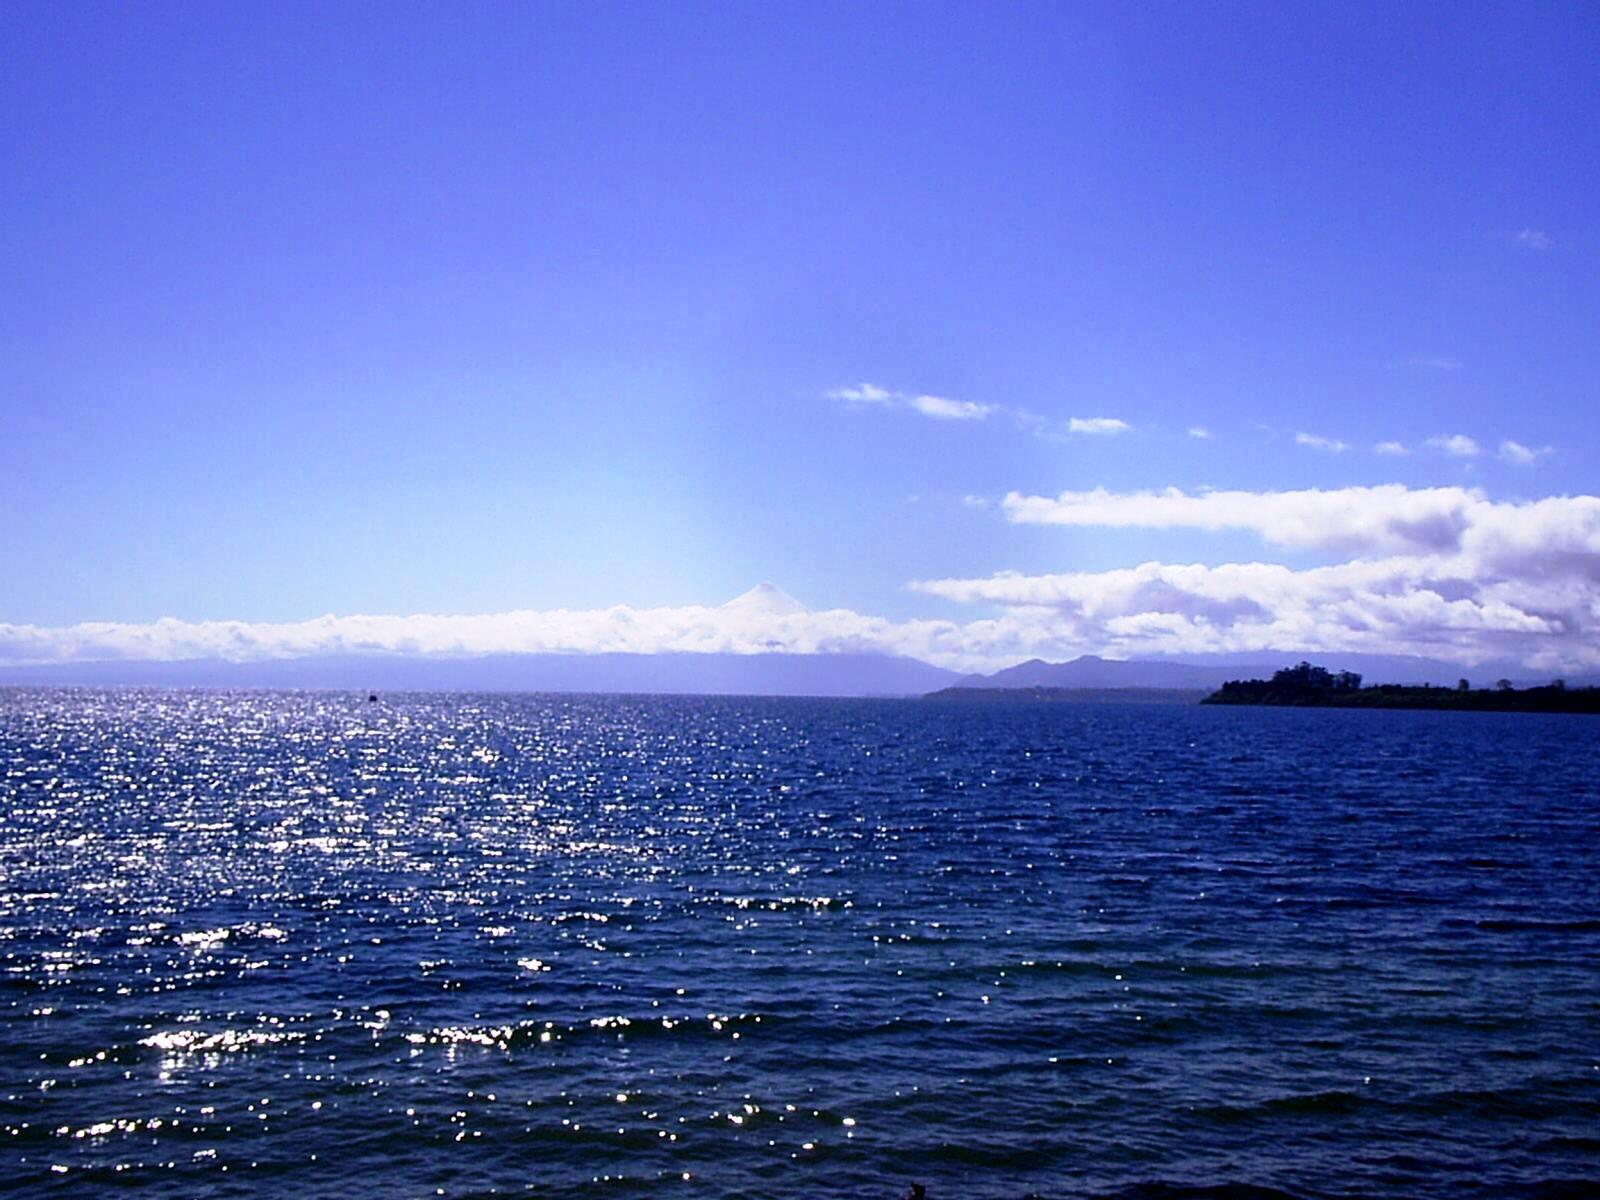 Puerto Montt - Puerto Varas - Frutillar - Chiloé - Petrohué